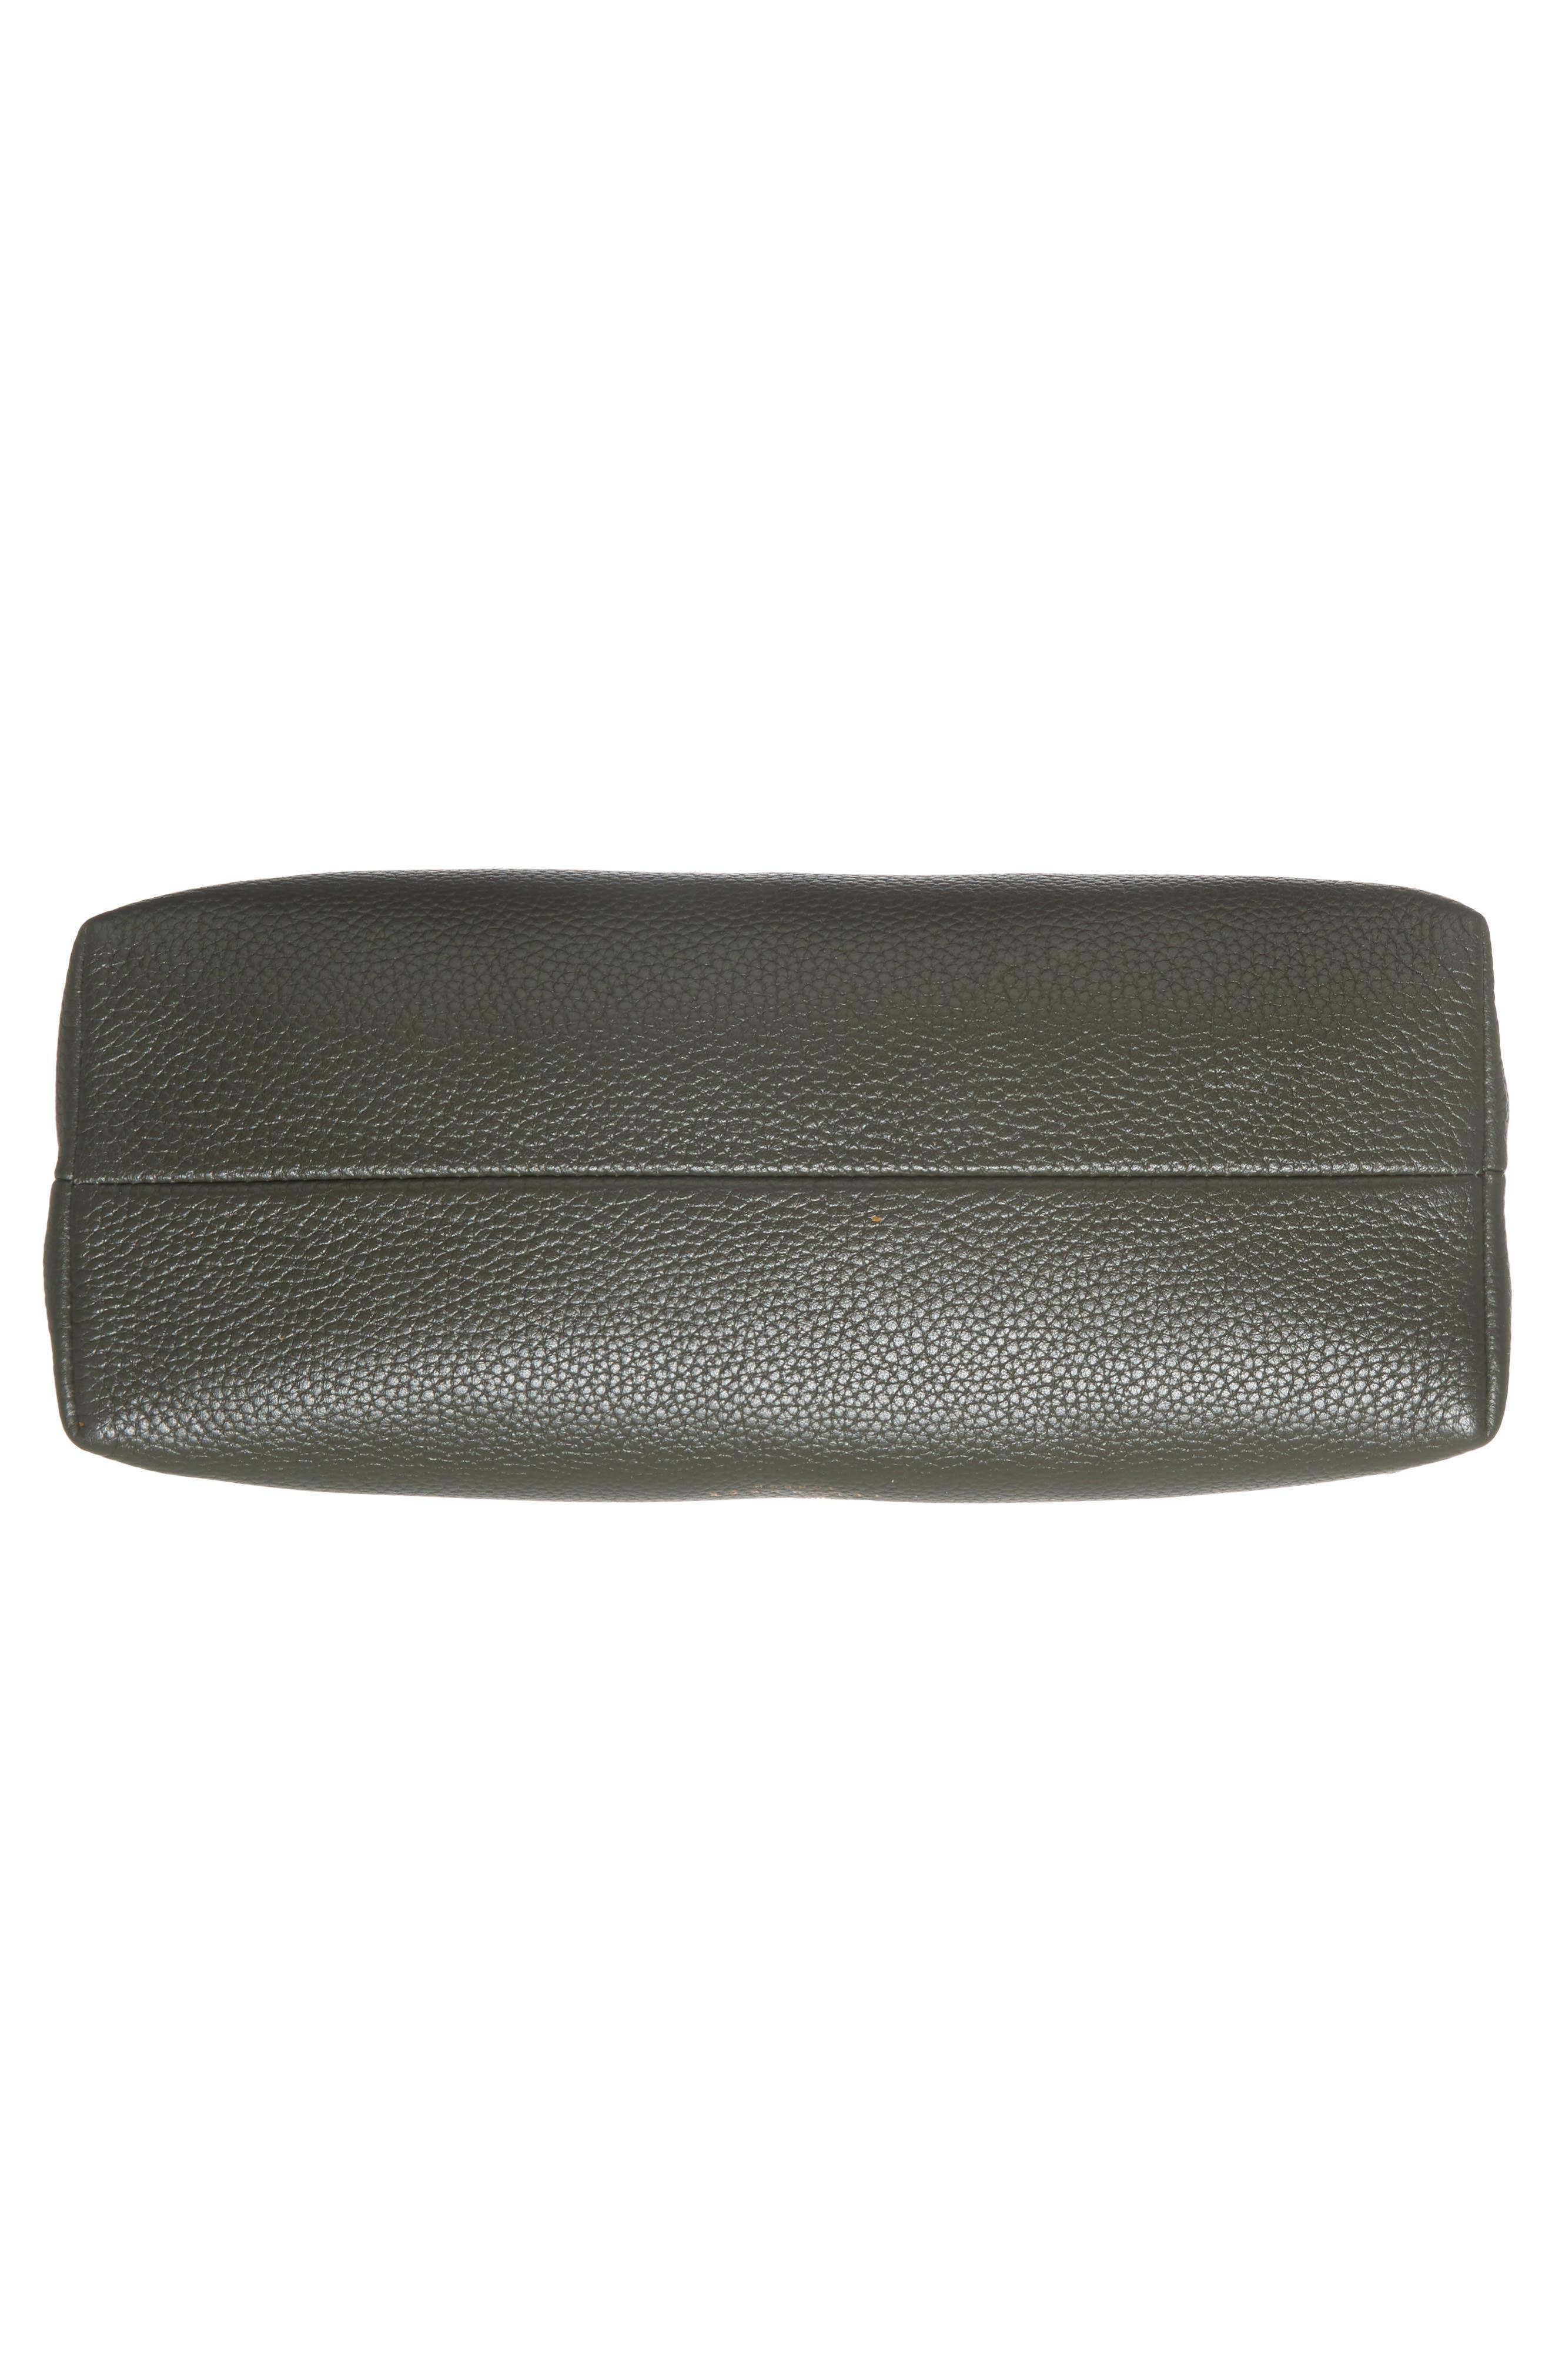 Sorikai Leather & Suede Crossbody Bag,                             Alternate thumbnail 5, color,                             Khaki